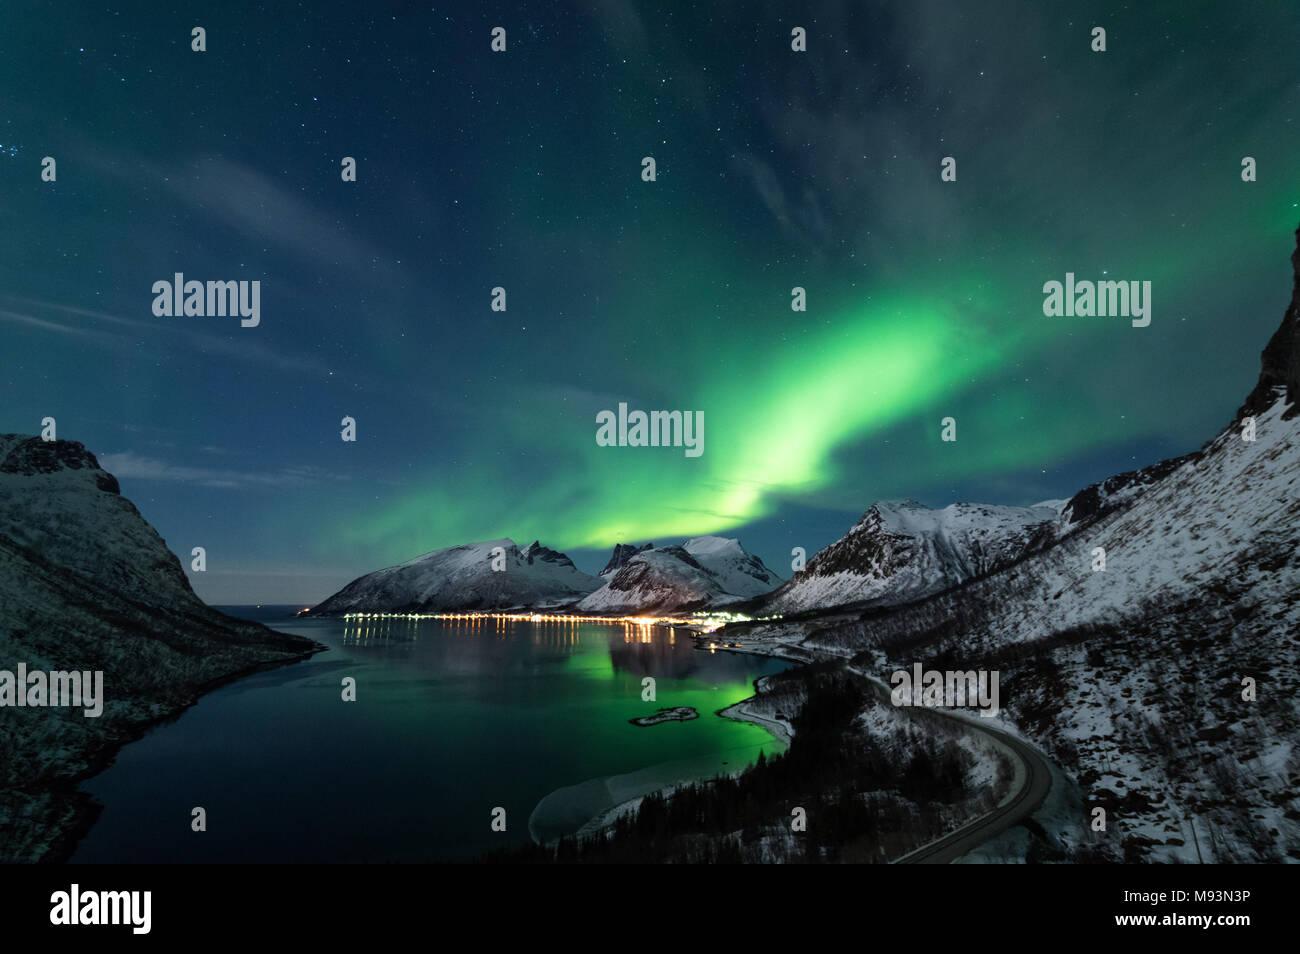 Northern Lights in Senja, Norway - Stock Image